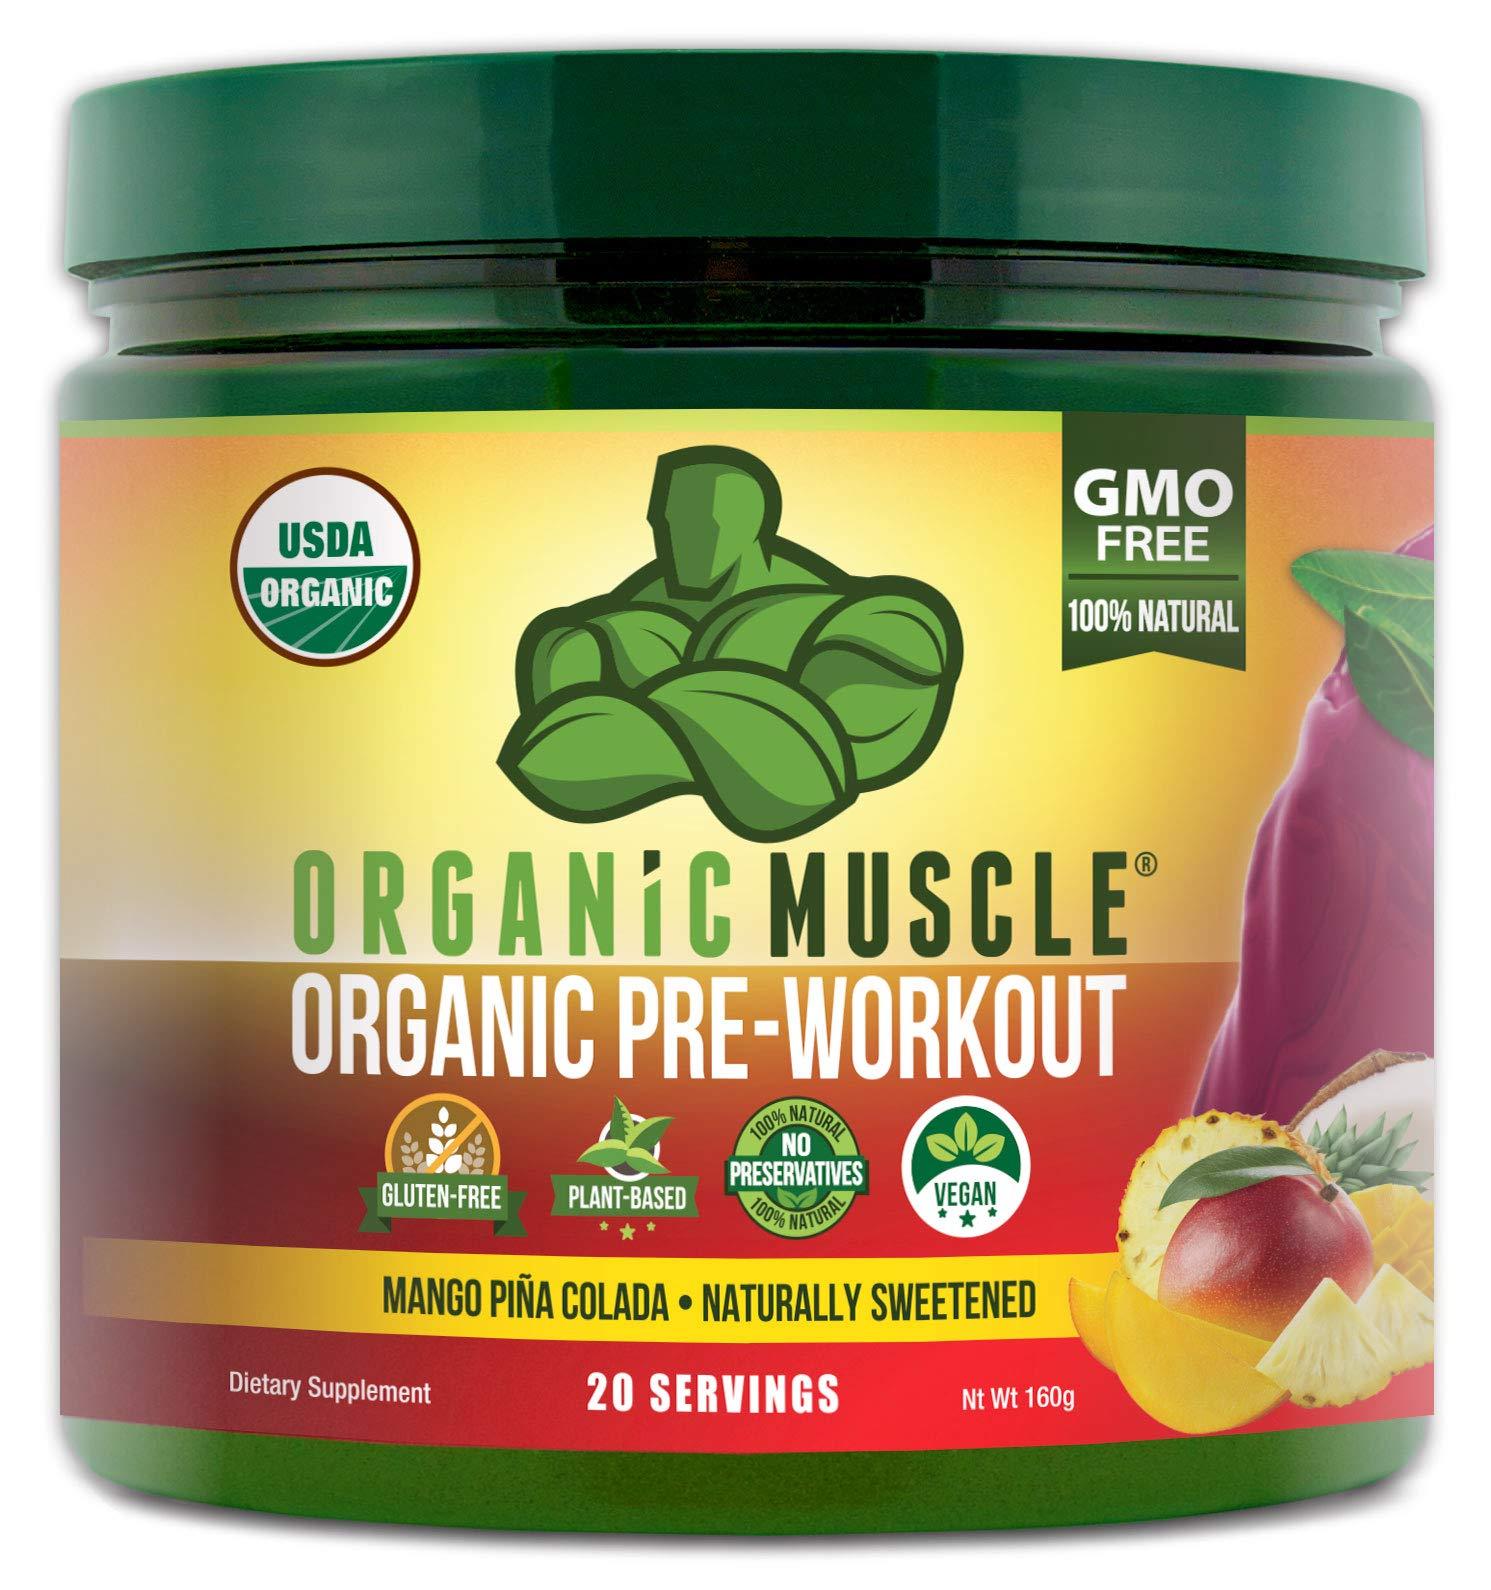 ORGANIC MUSCLE #1 Rated Organic Pre Workout Powder | **NEW Flavor** | Natural Vegan Keto Pre-Workout & Organic Energy Supplement for Men & Women | Non-GMO, Paleo, Plant Based | Mango Piña Colada |160g